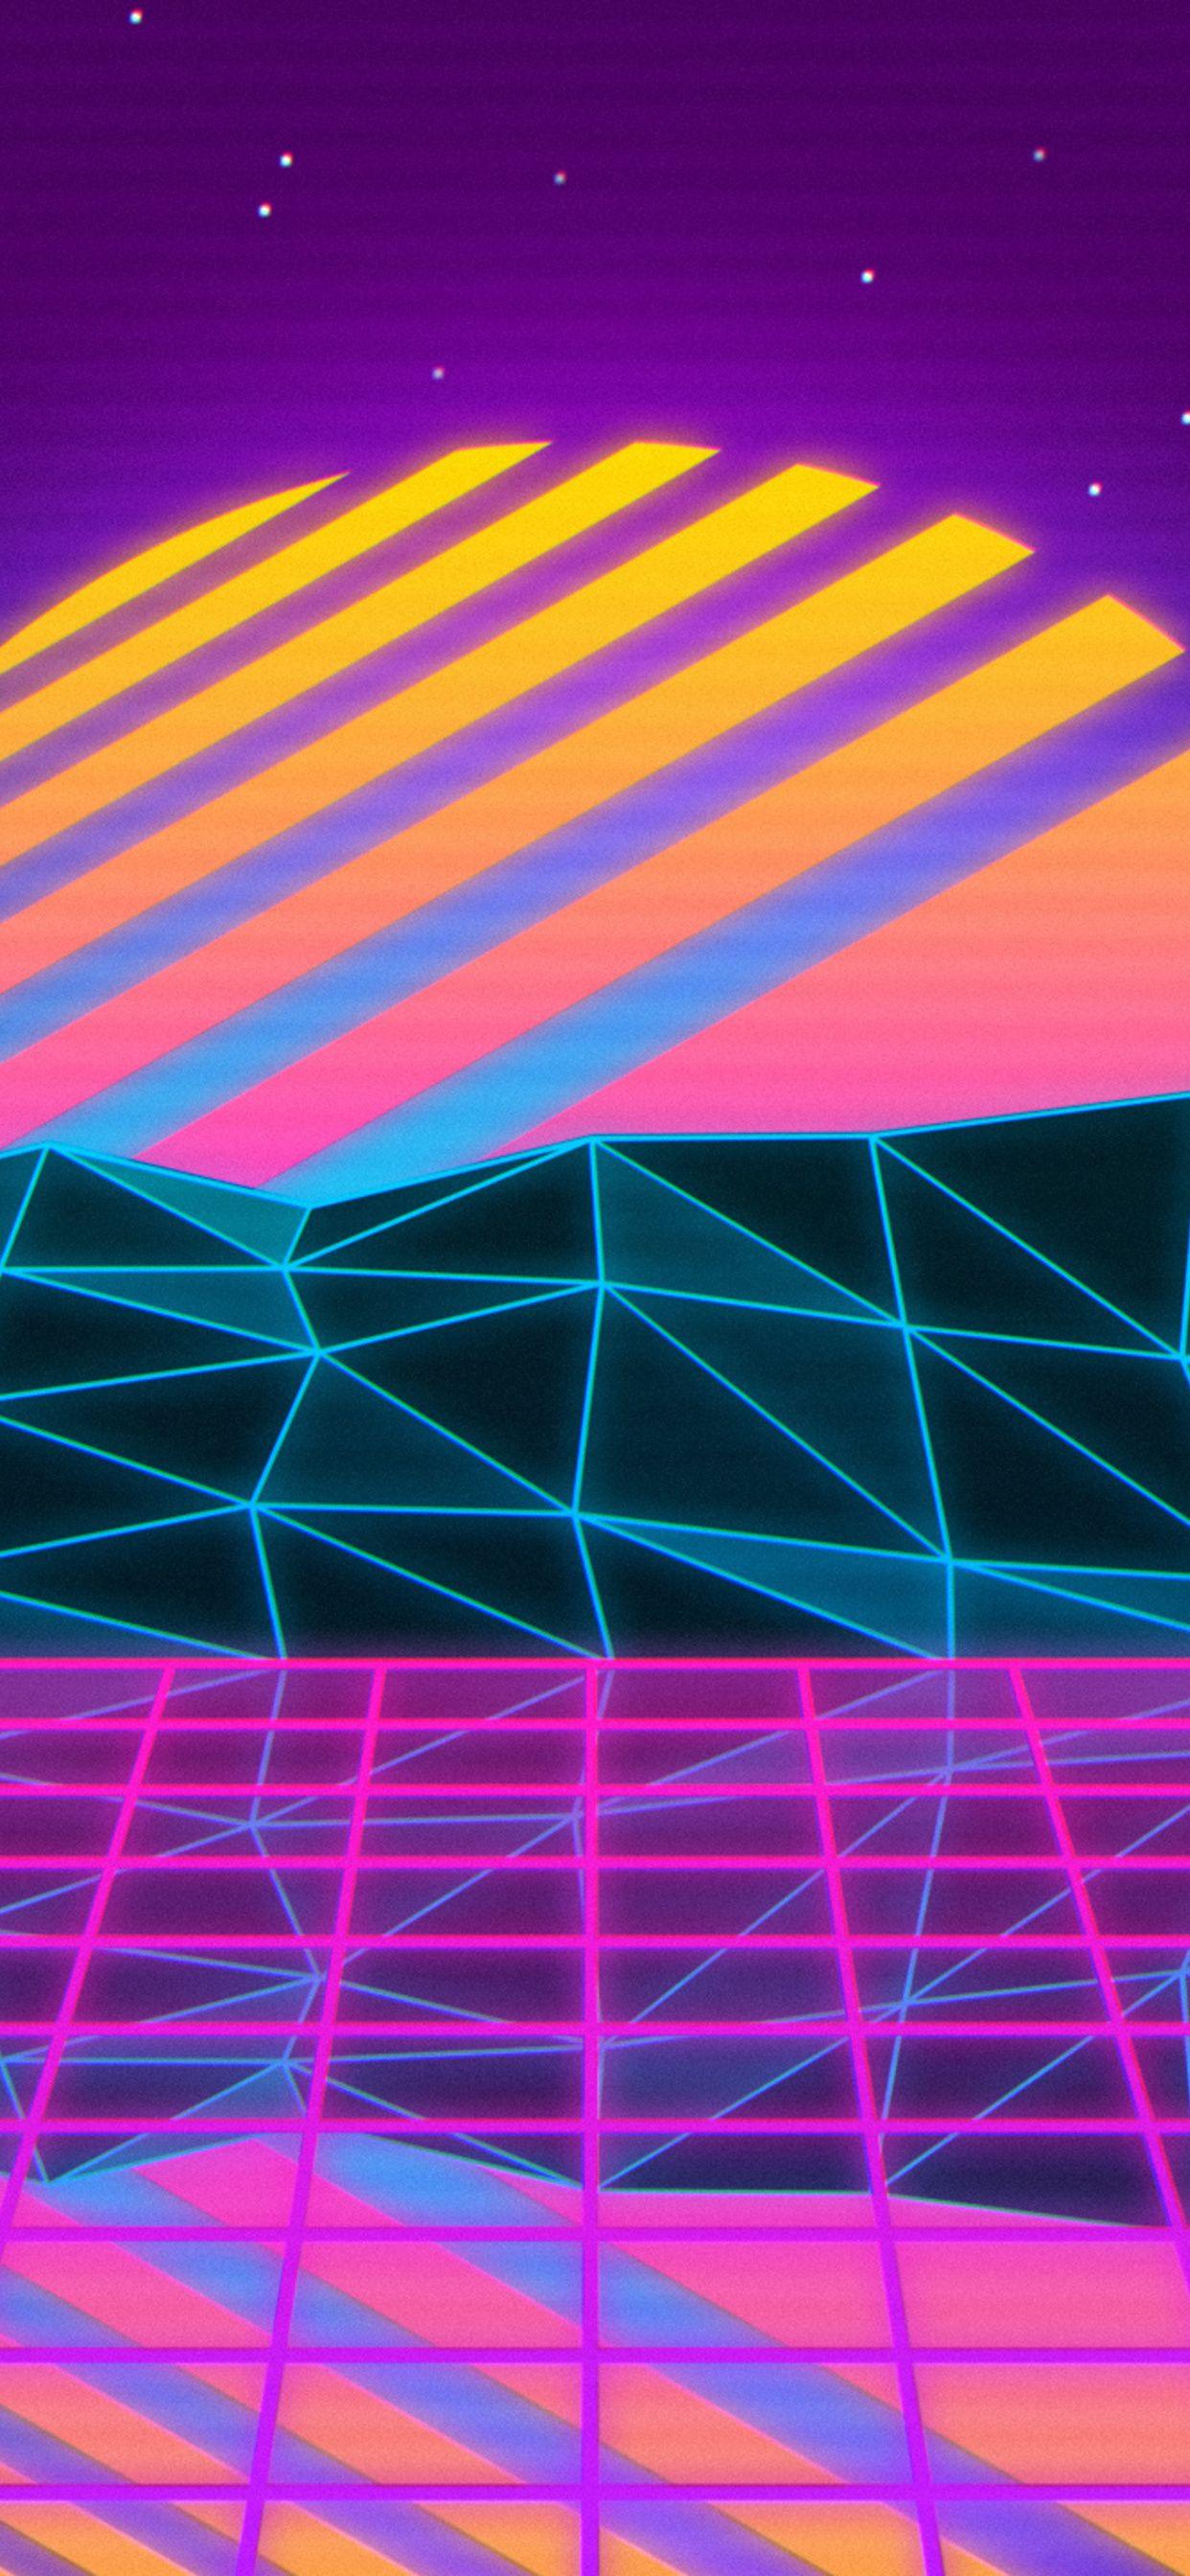 Vaporwave iPhone Wallpapers - Wallpaper Cave